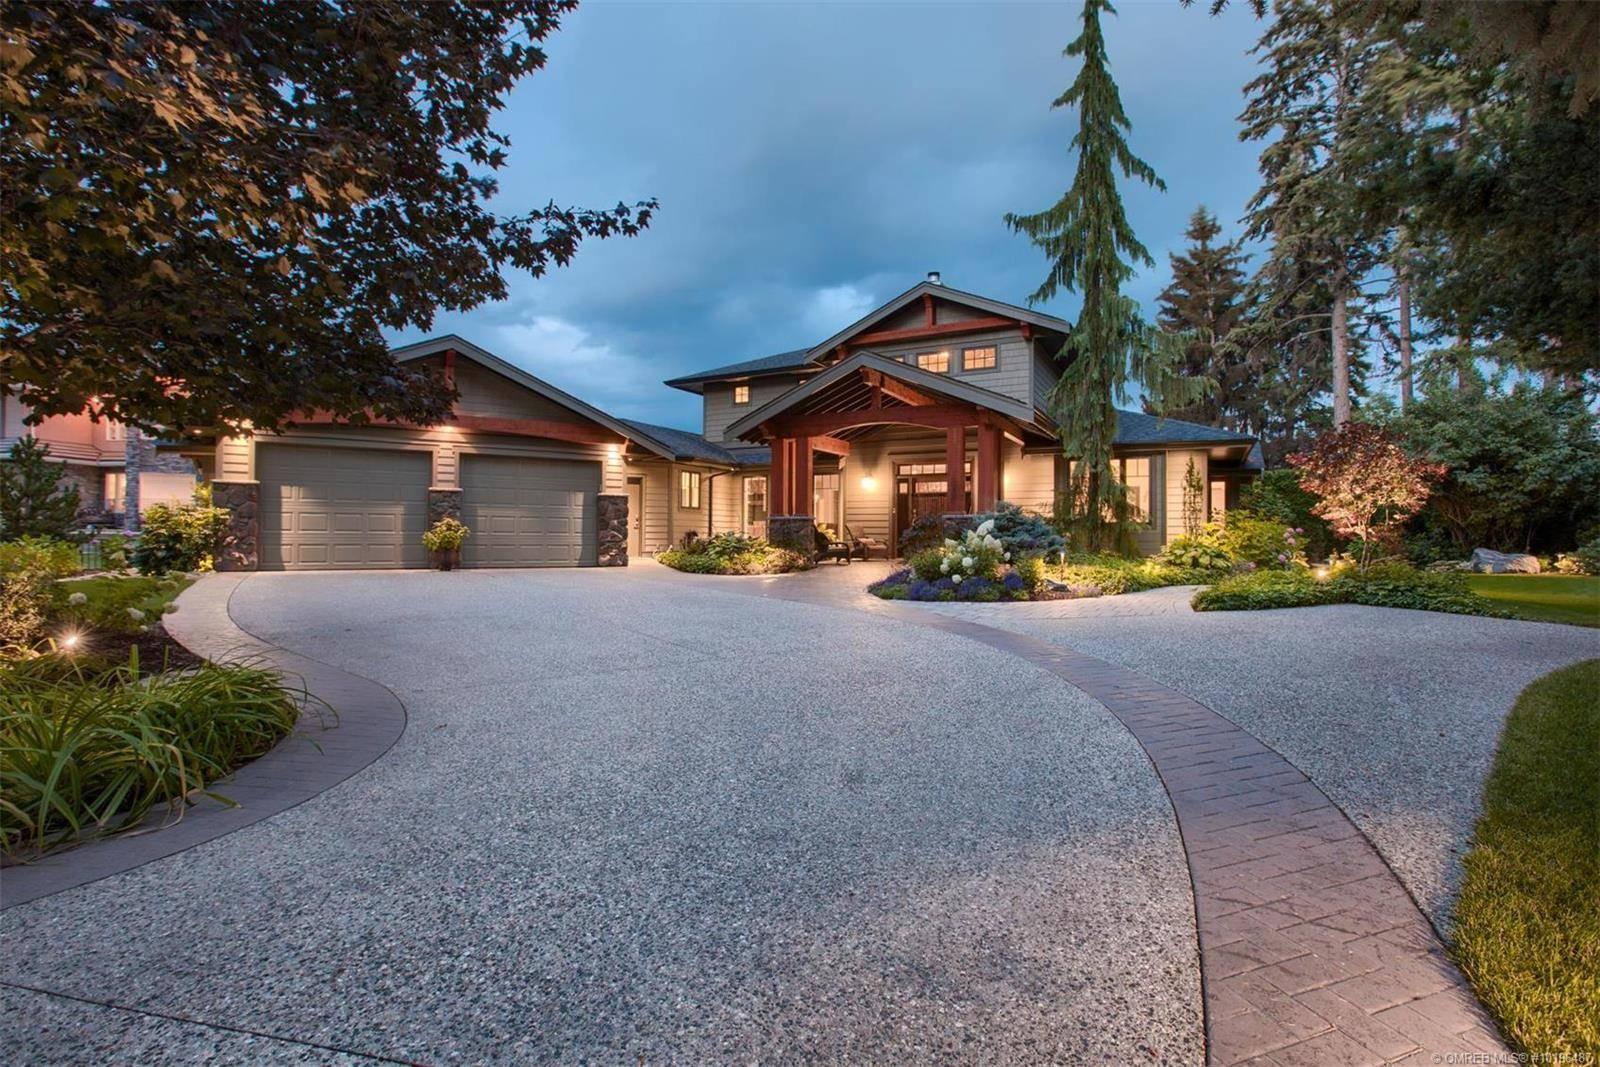 House for sale at 4295 Hobson Rd Kelowna British Columbia - MLS: 10196487